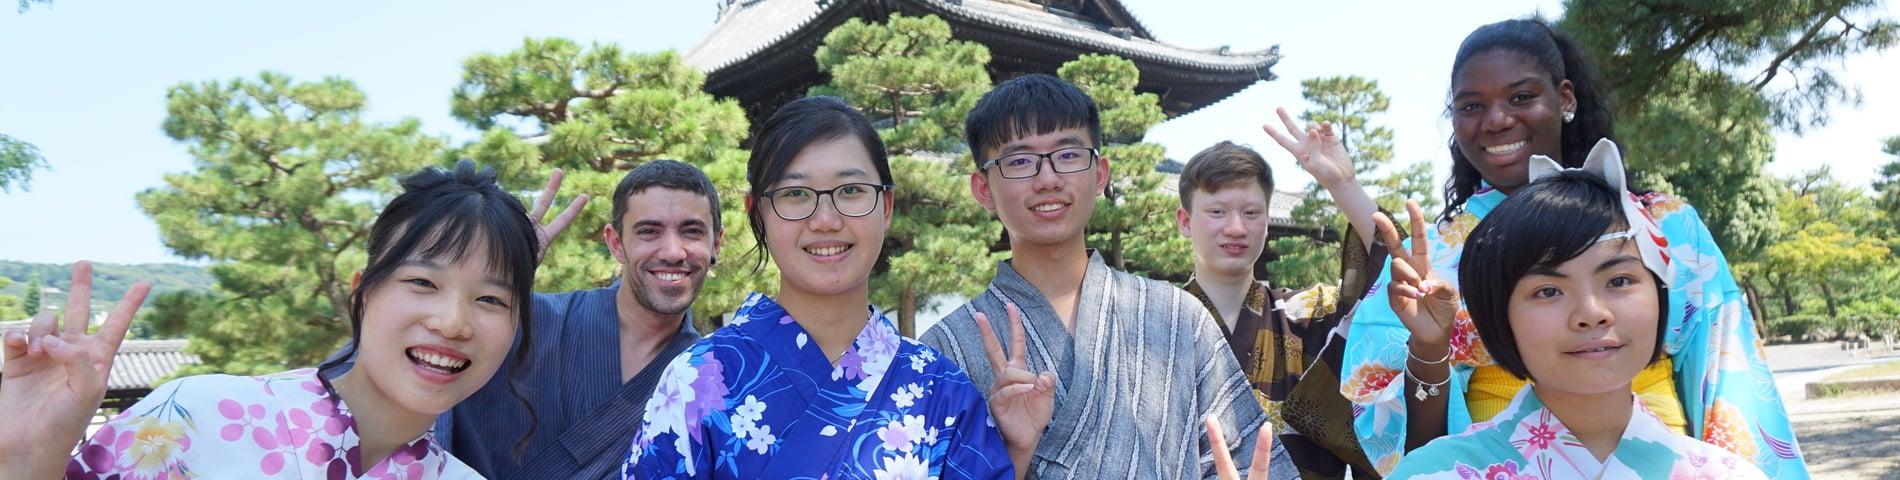 Kyoto JaLS зображення 1